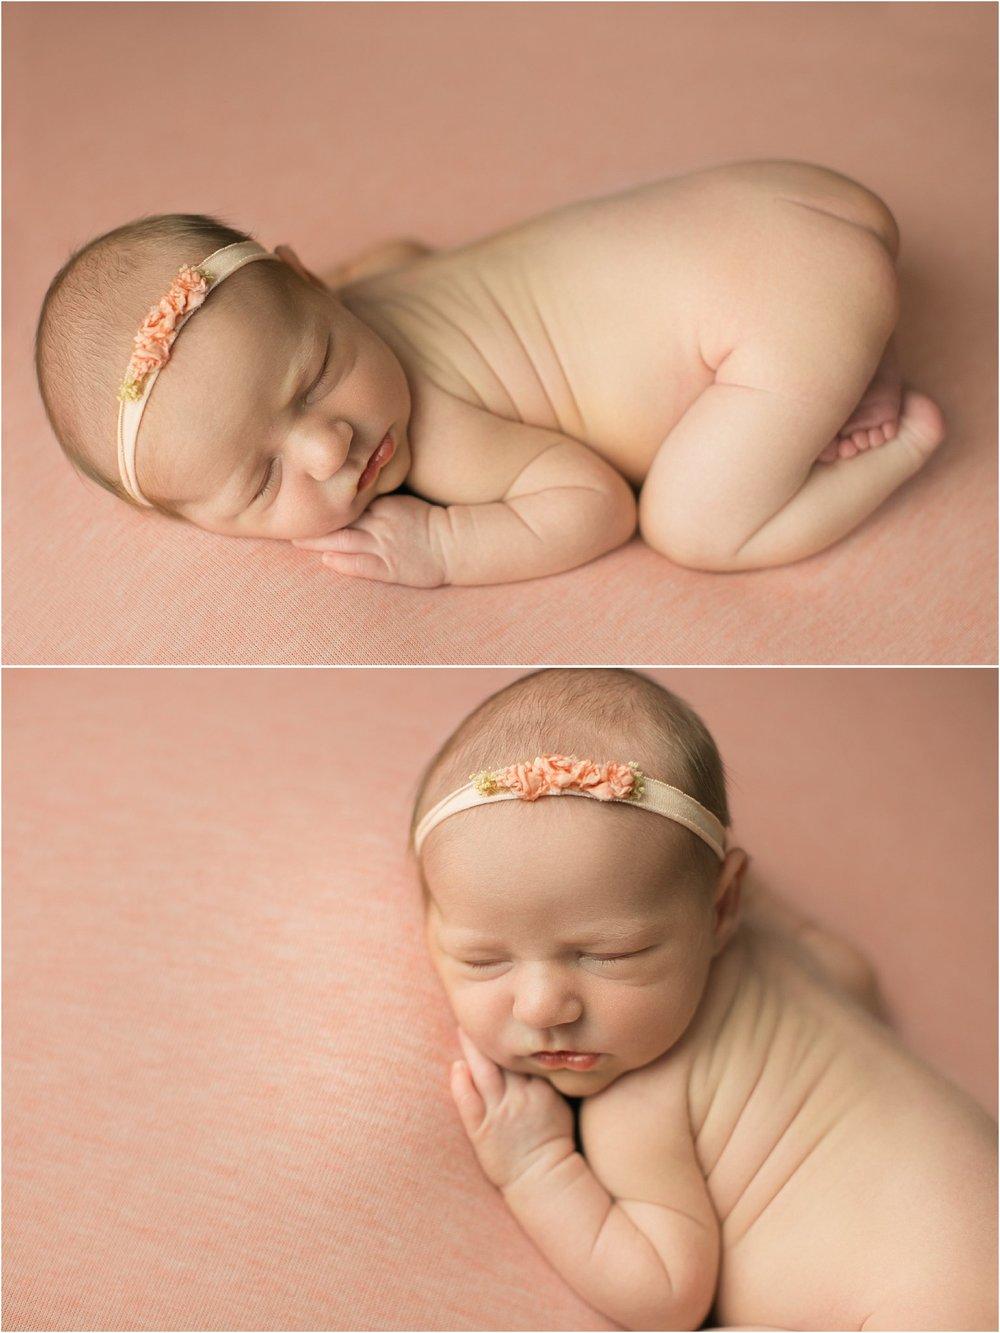 newborn baby girl on peach background tushie up pose